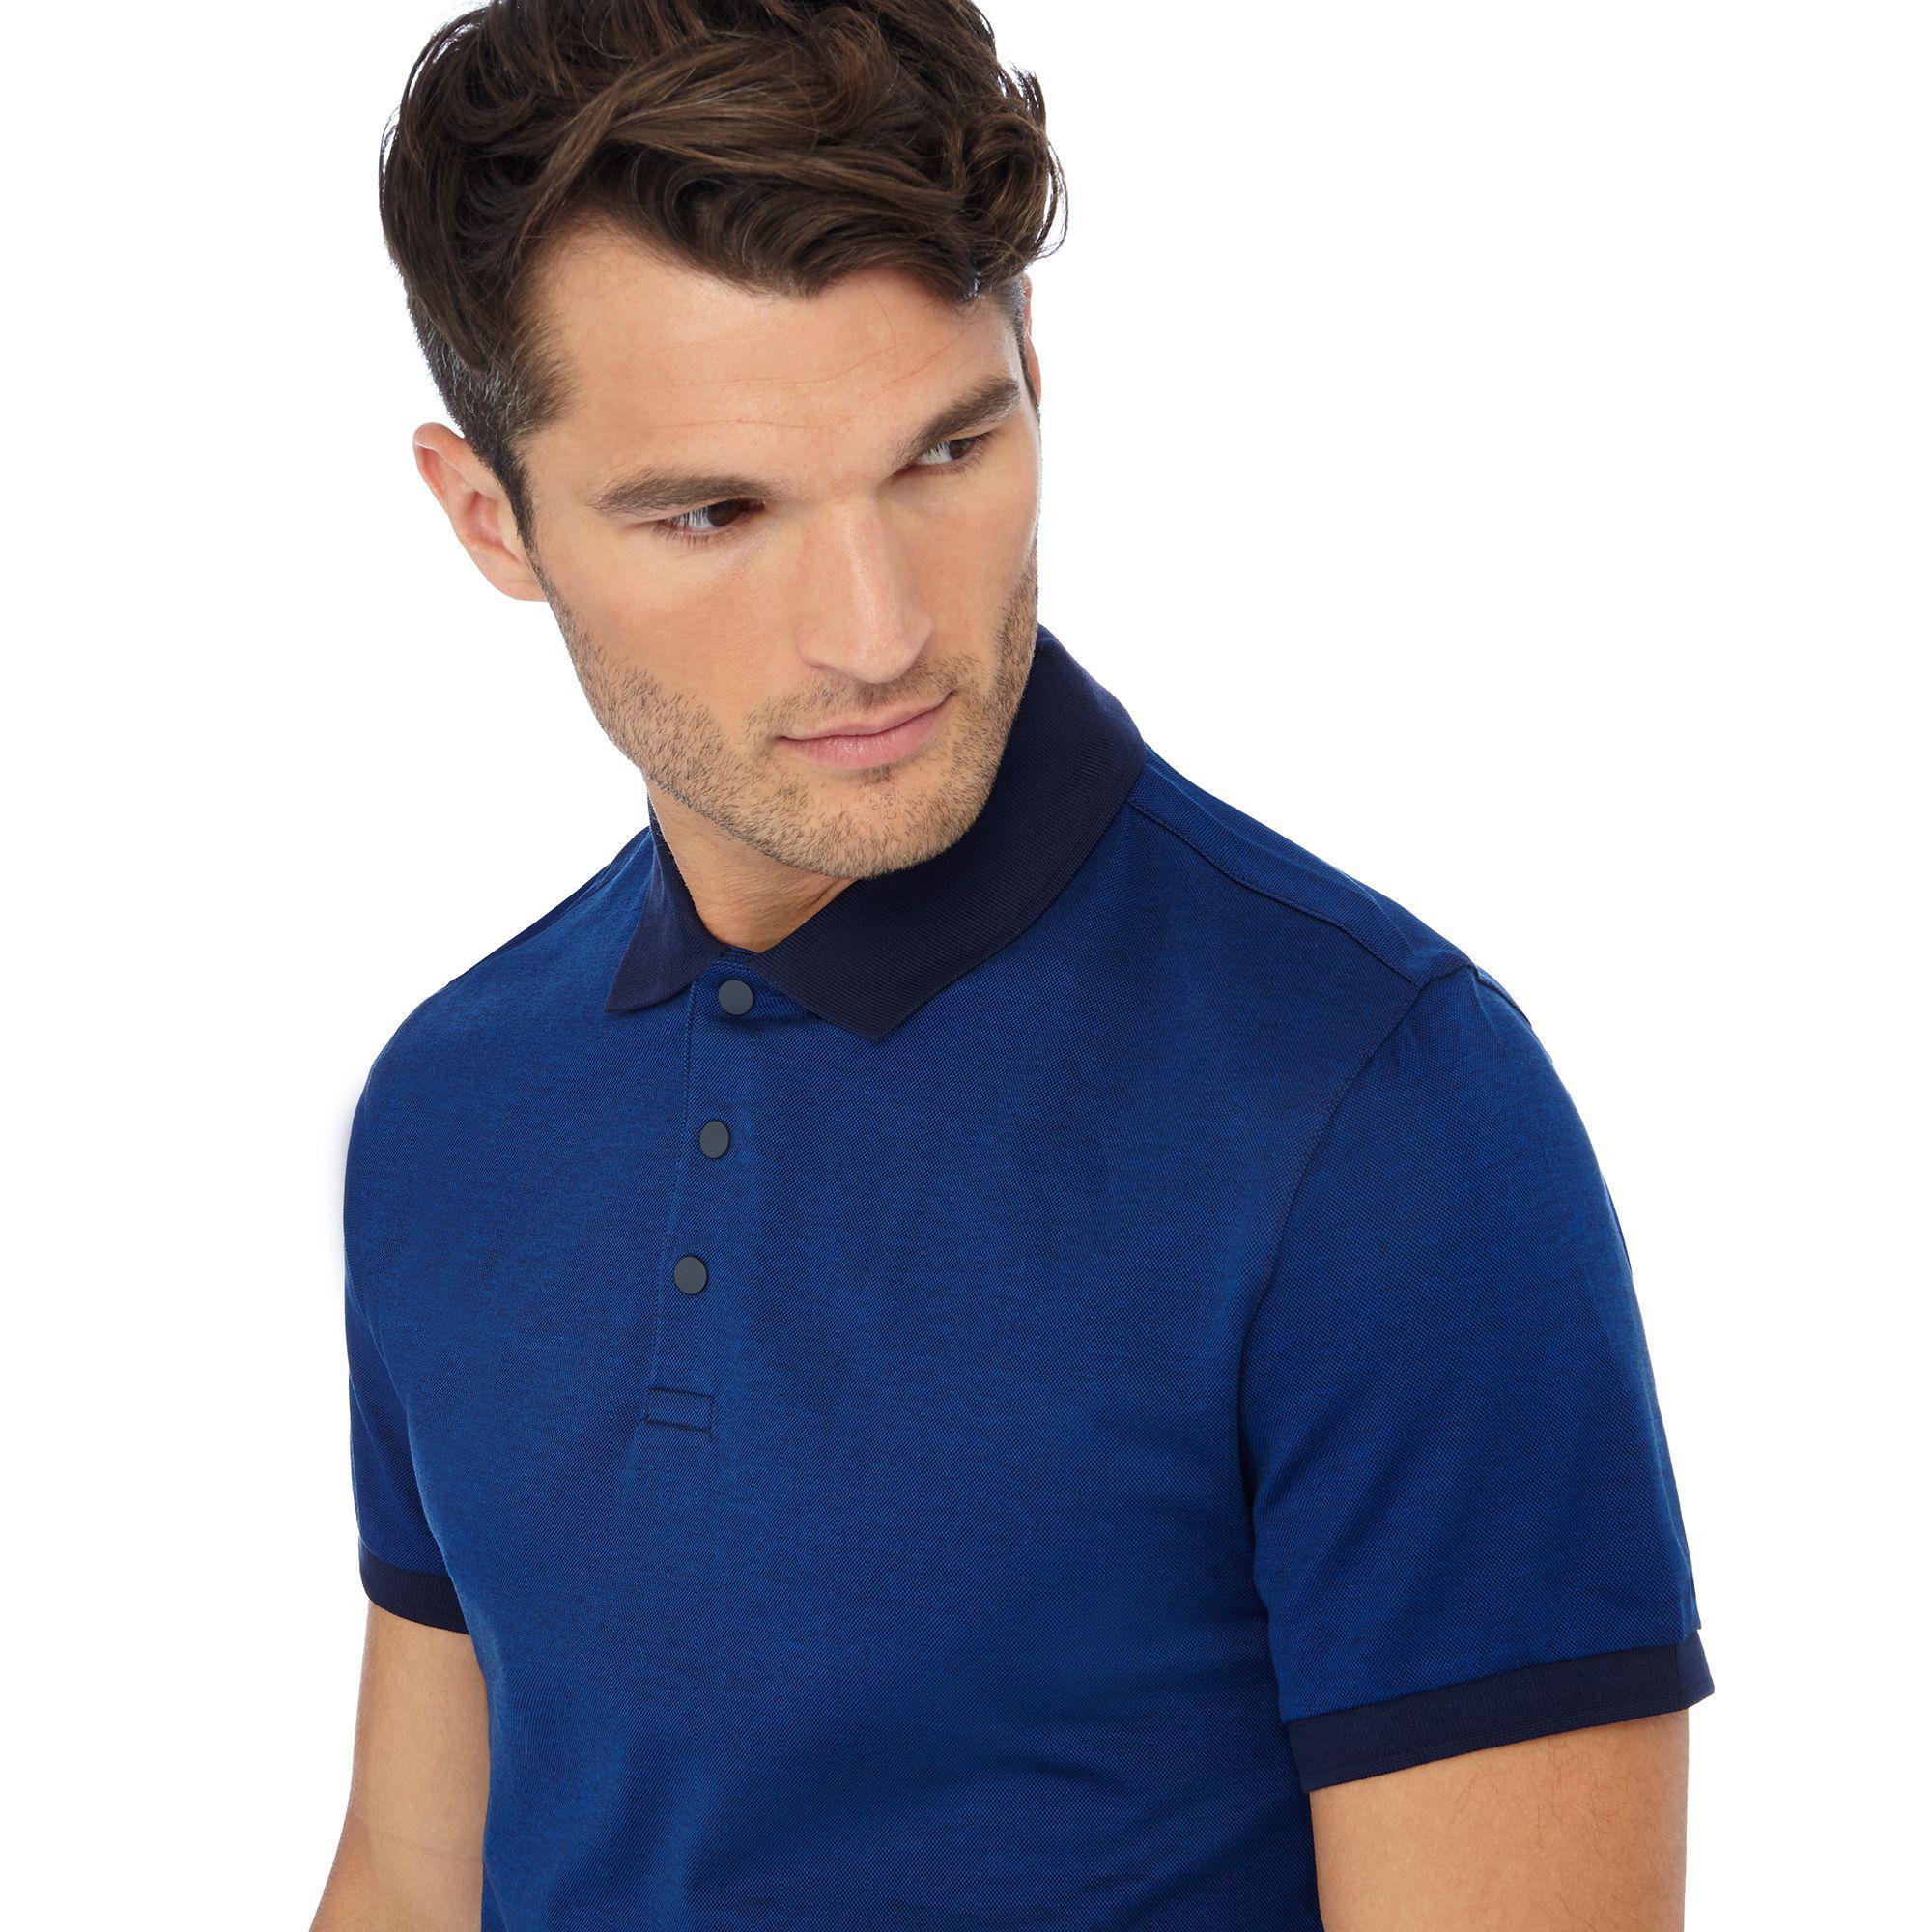 20341160278 J By Jasper Conran Big And Tall Royal Blue Contrast Collar Polo ...